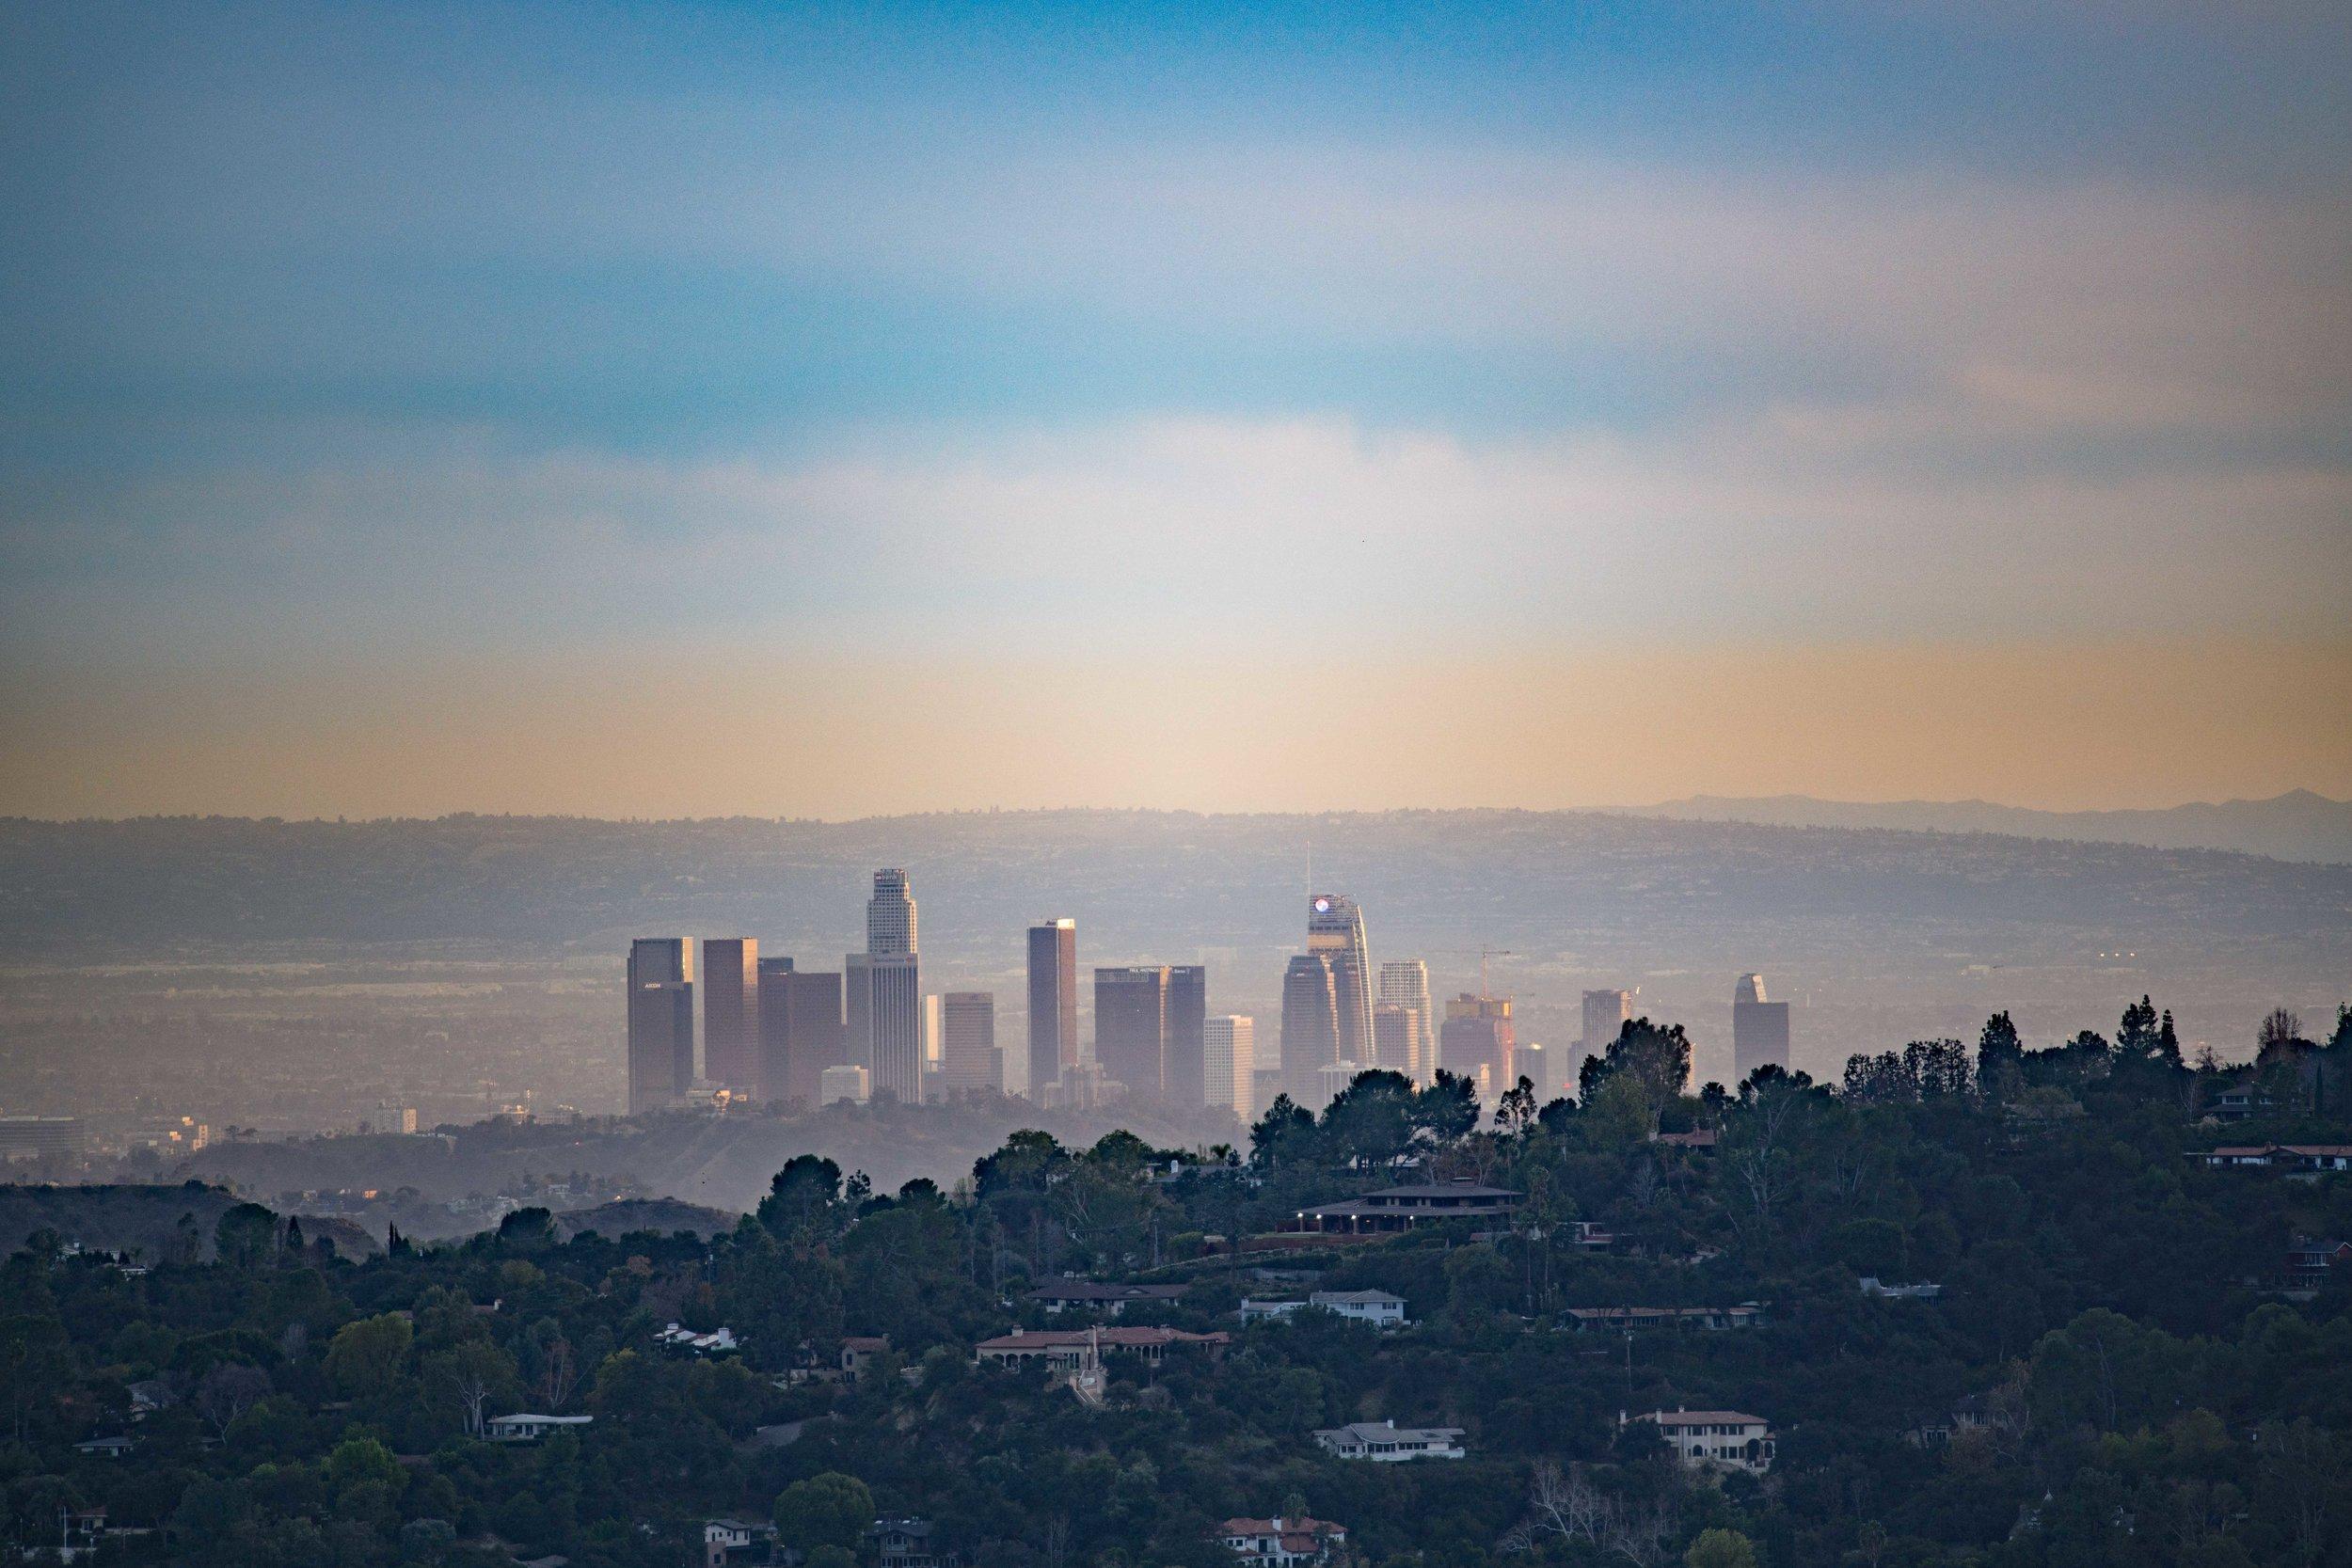 CA5 09 2018 01 LAX burbank hills san juan capistrano-48.jpg